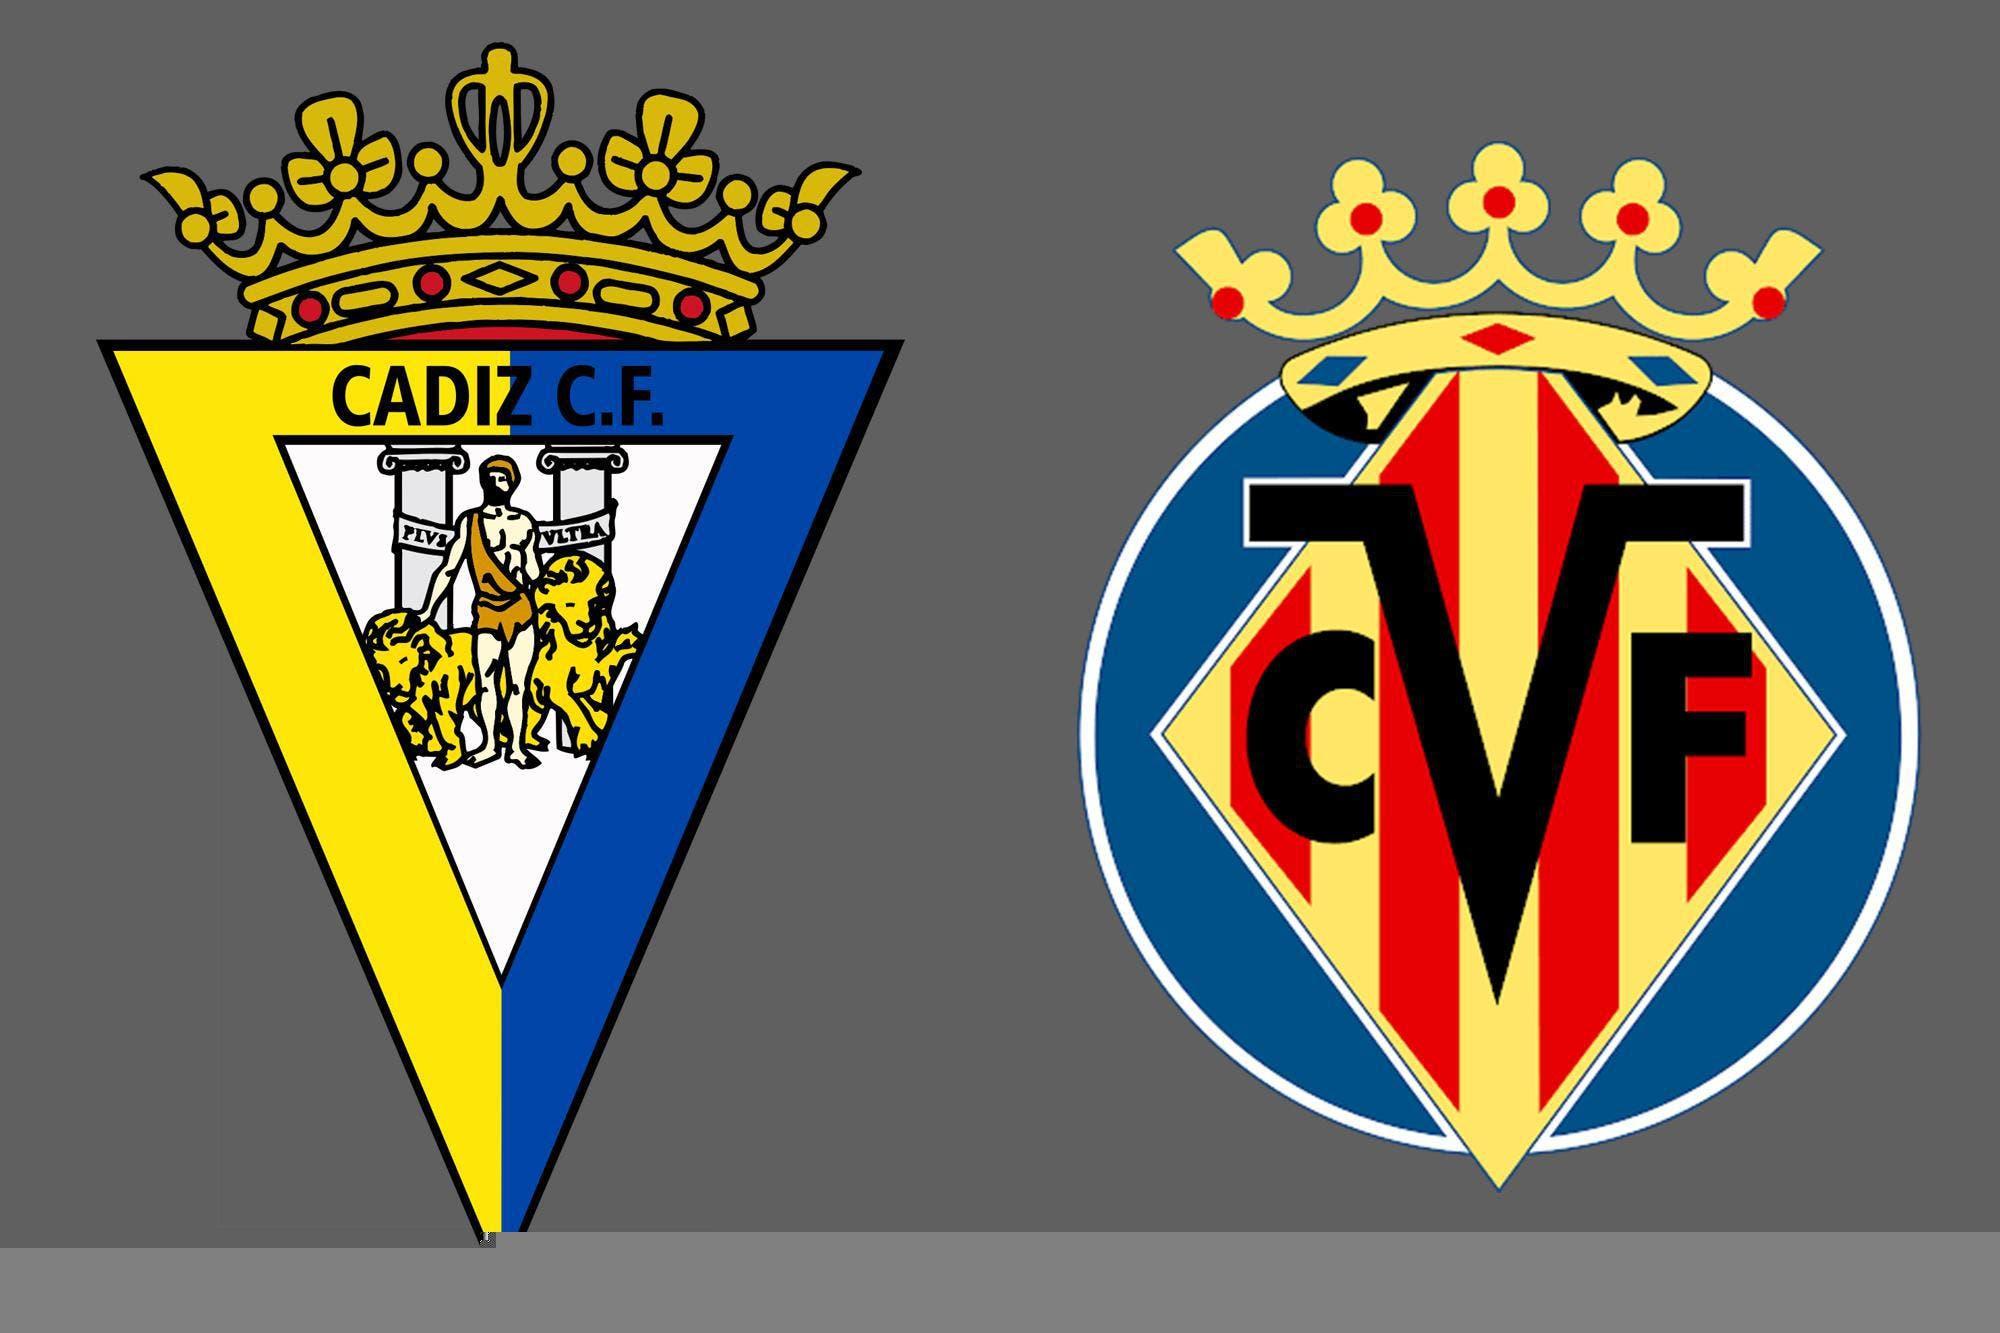 Liga de España: Cádiz y Villarreal empataron 0-0